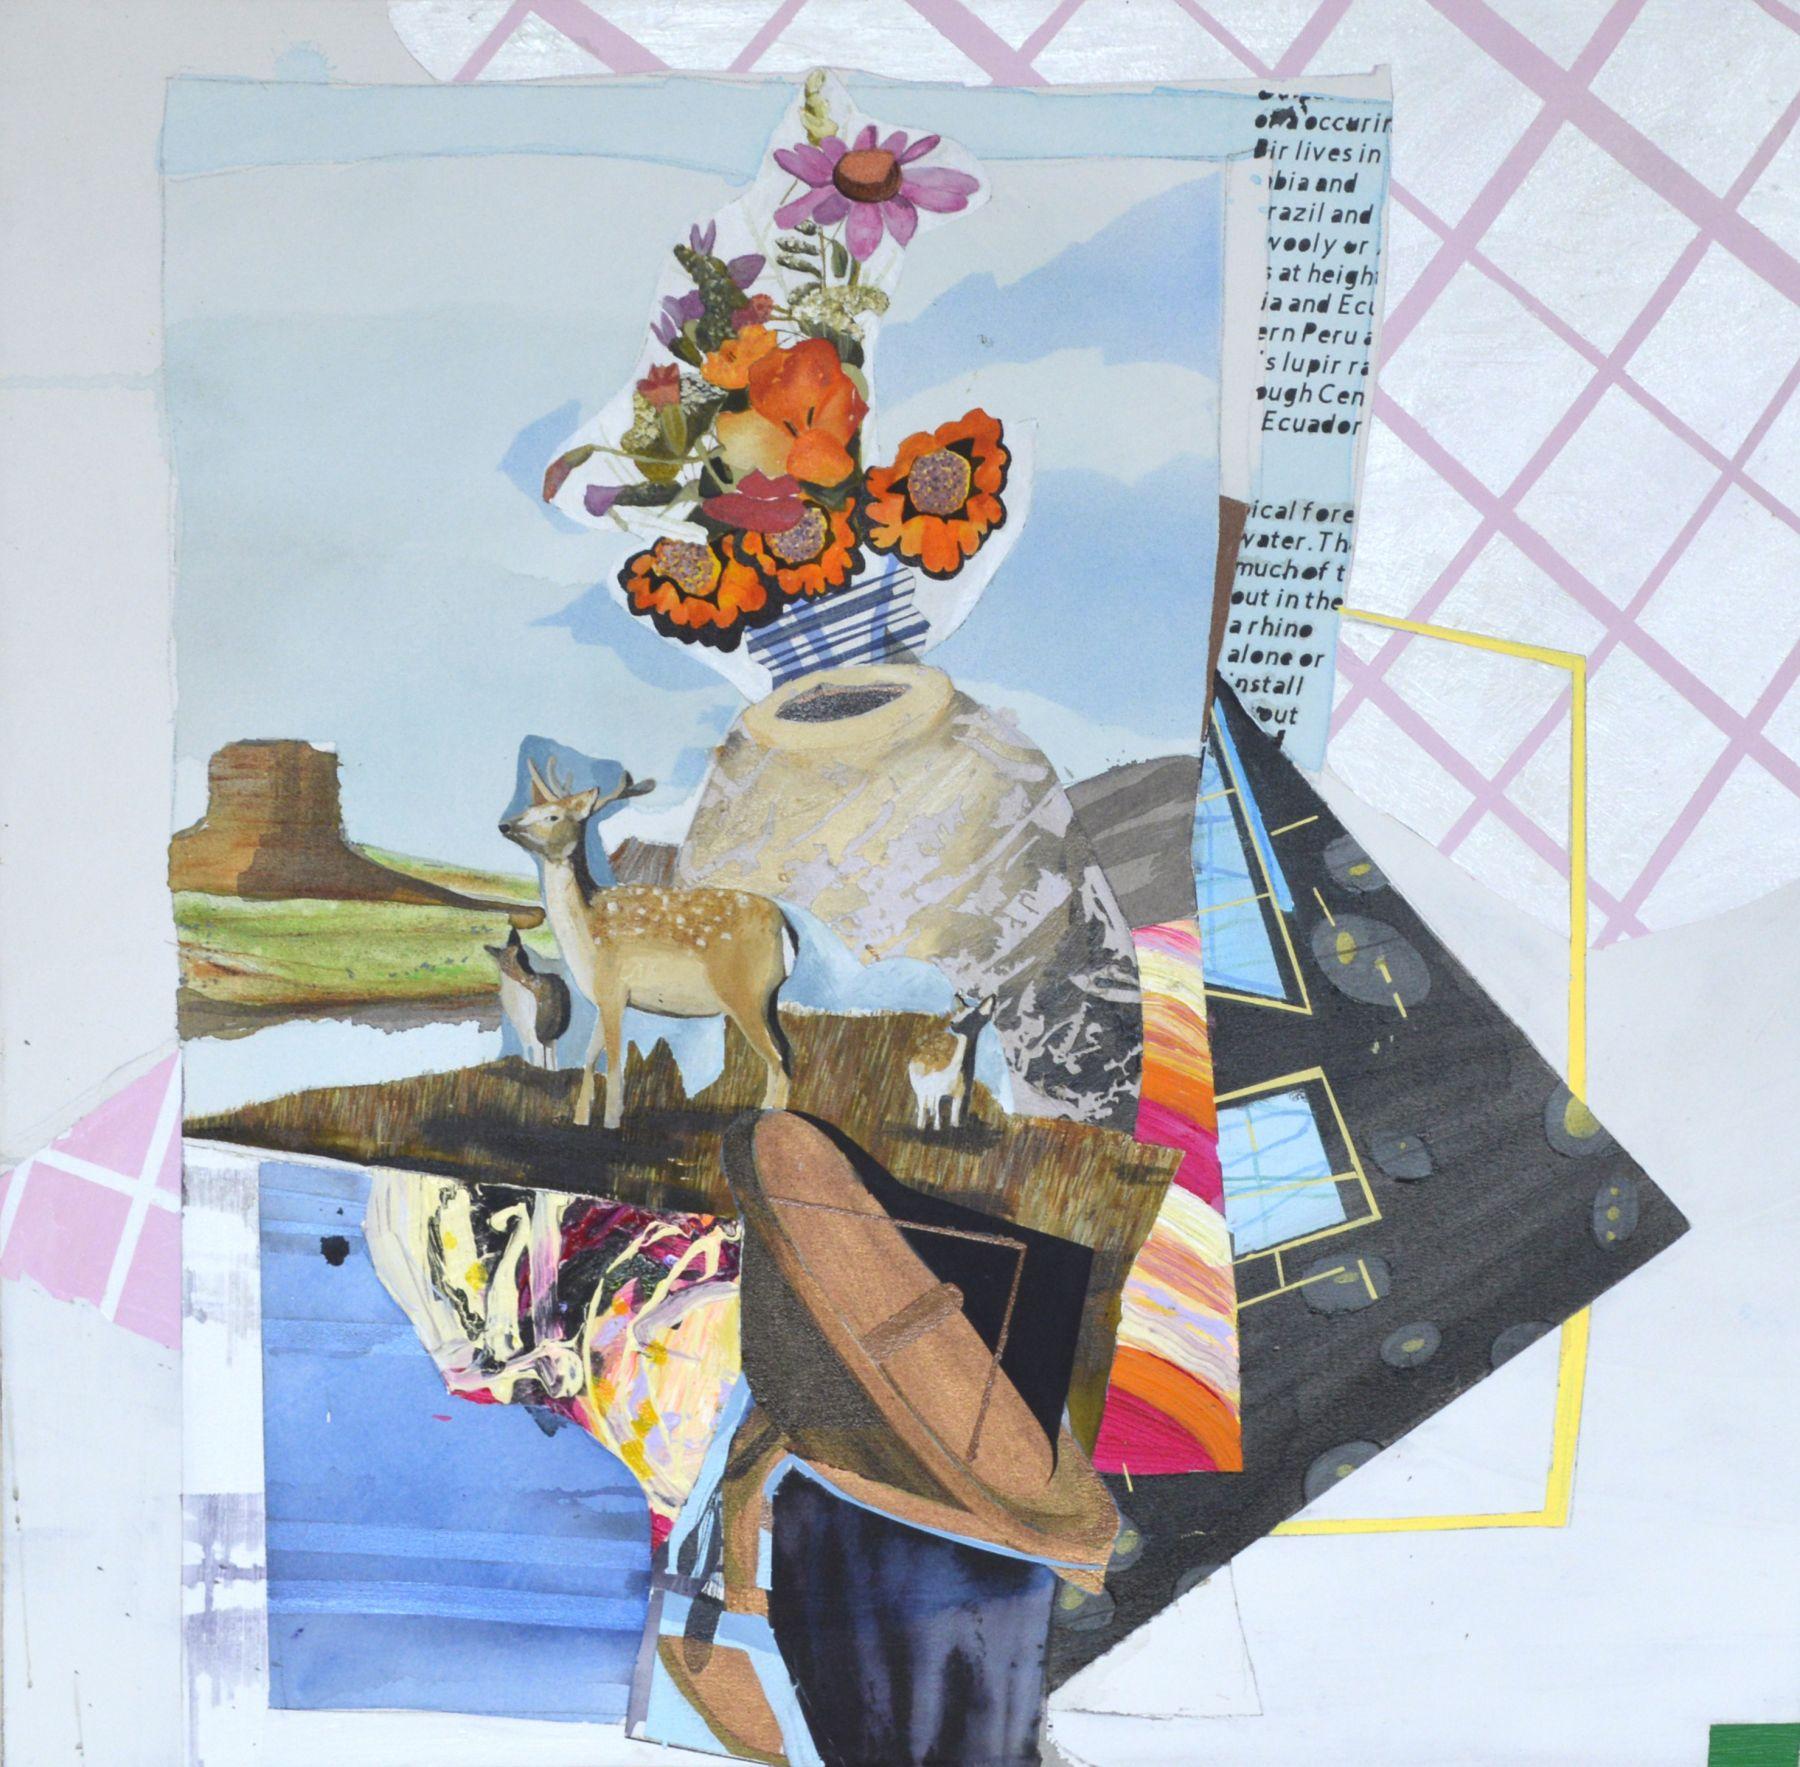 JENNY DAY, Miscalibration: relentless cervine optimism, 2019